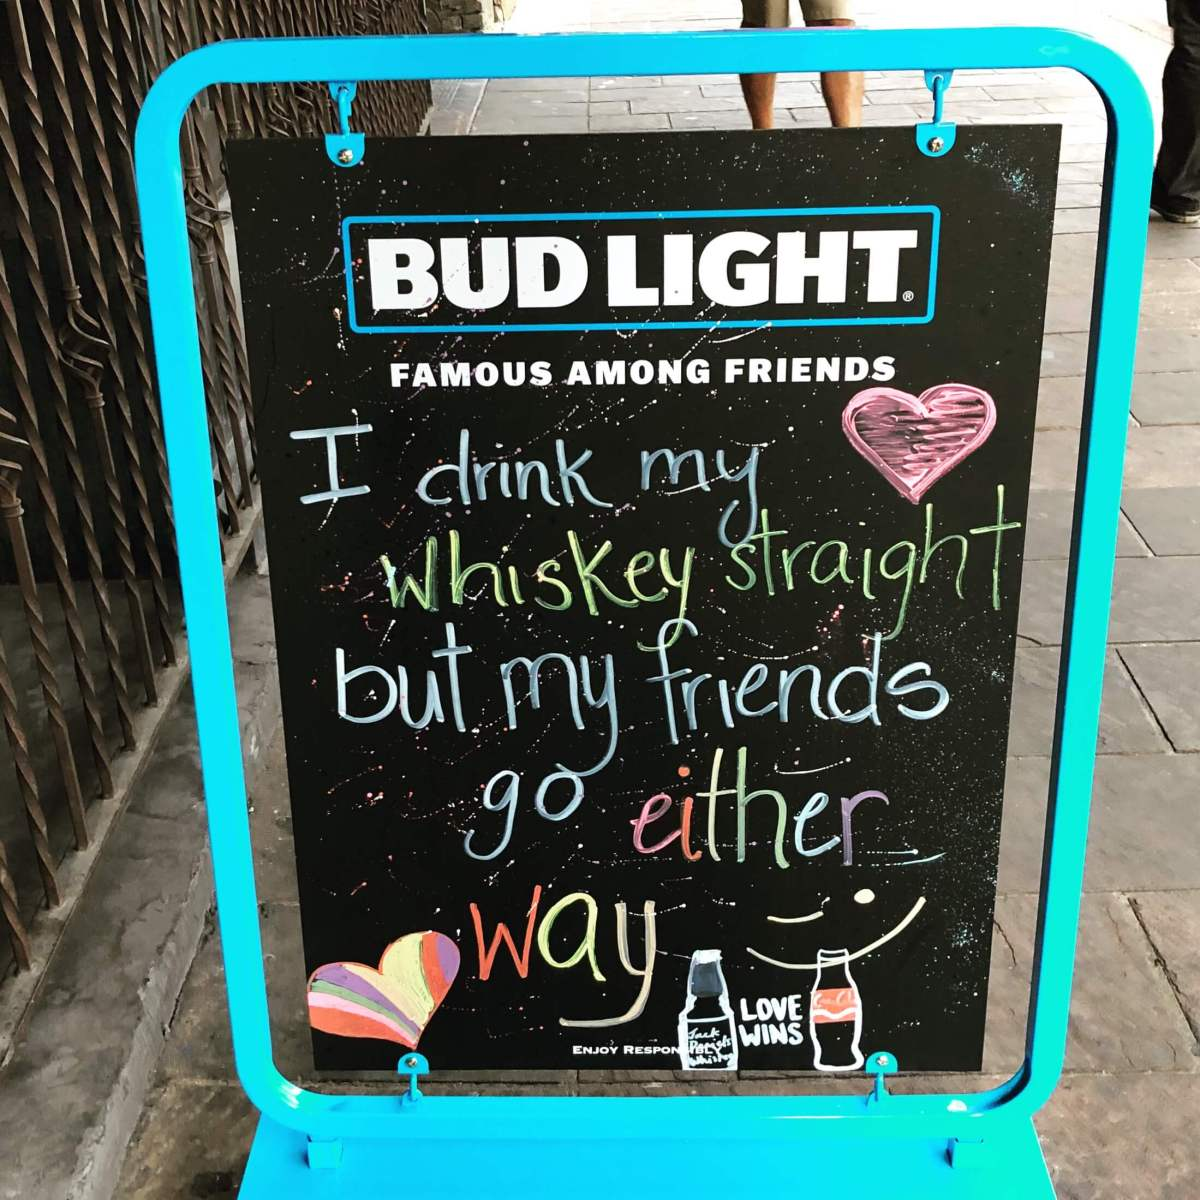 Billboard at a bar in 6th steet, Austin, Texas